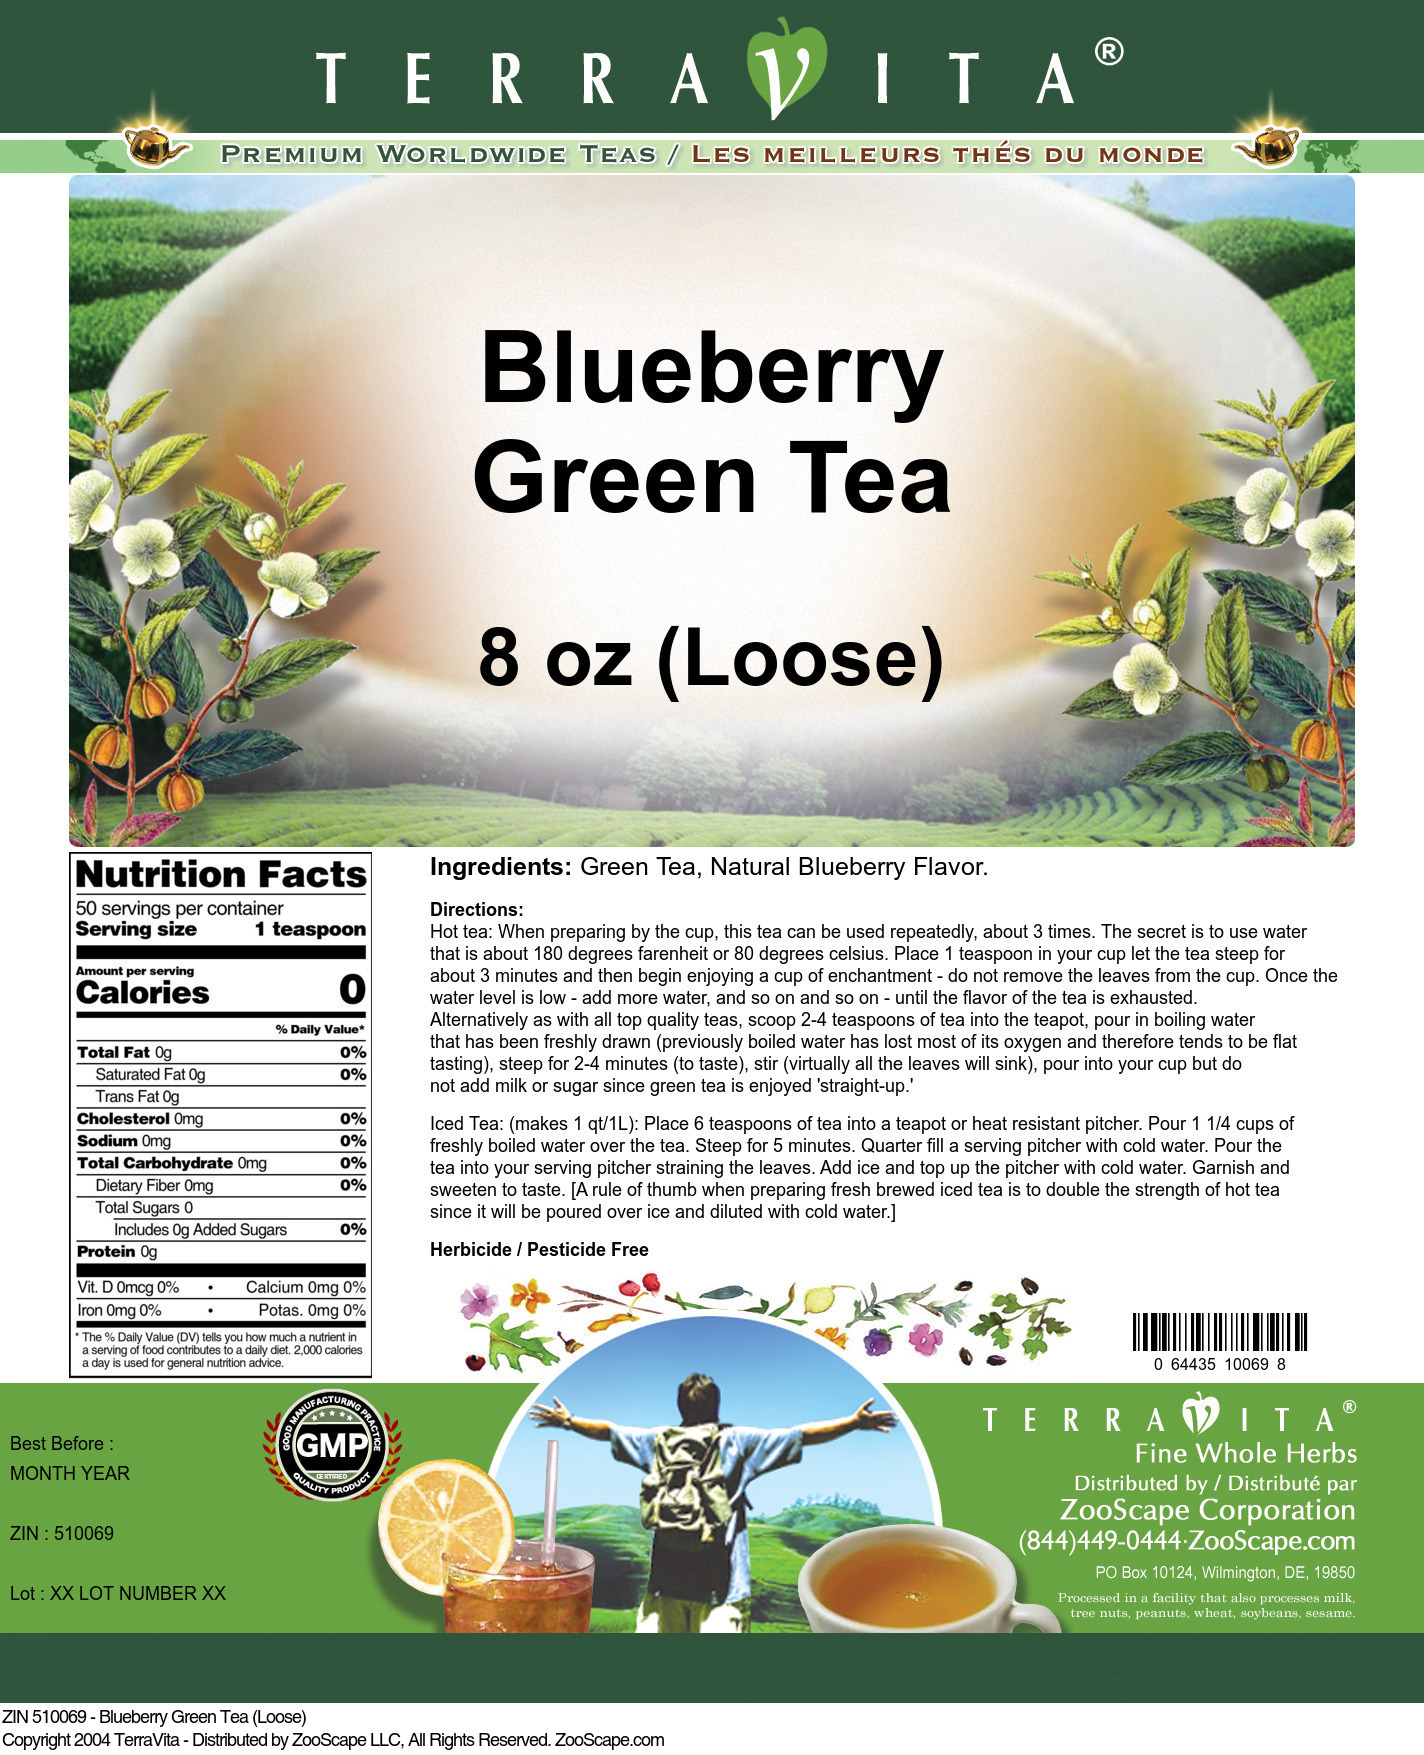 Blueberry Green Tea (Loose)